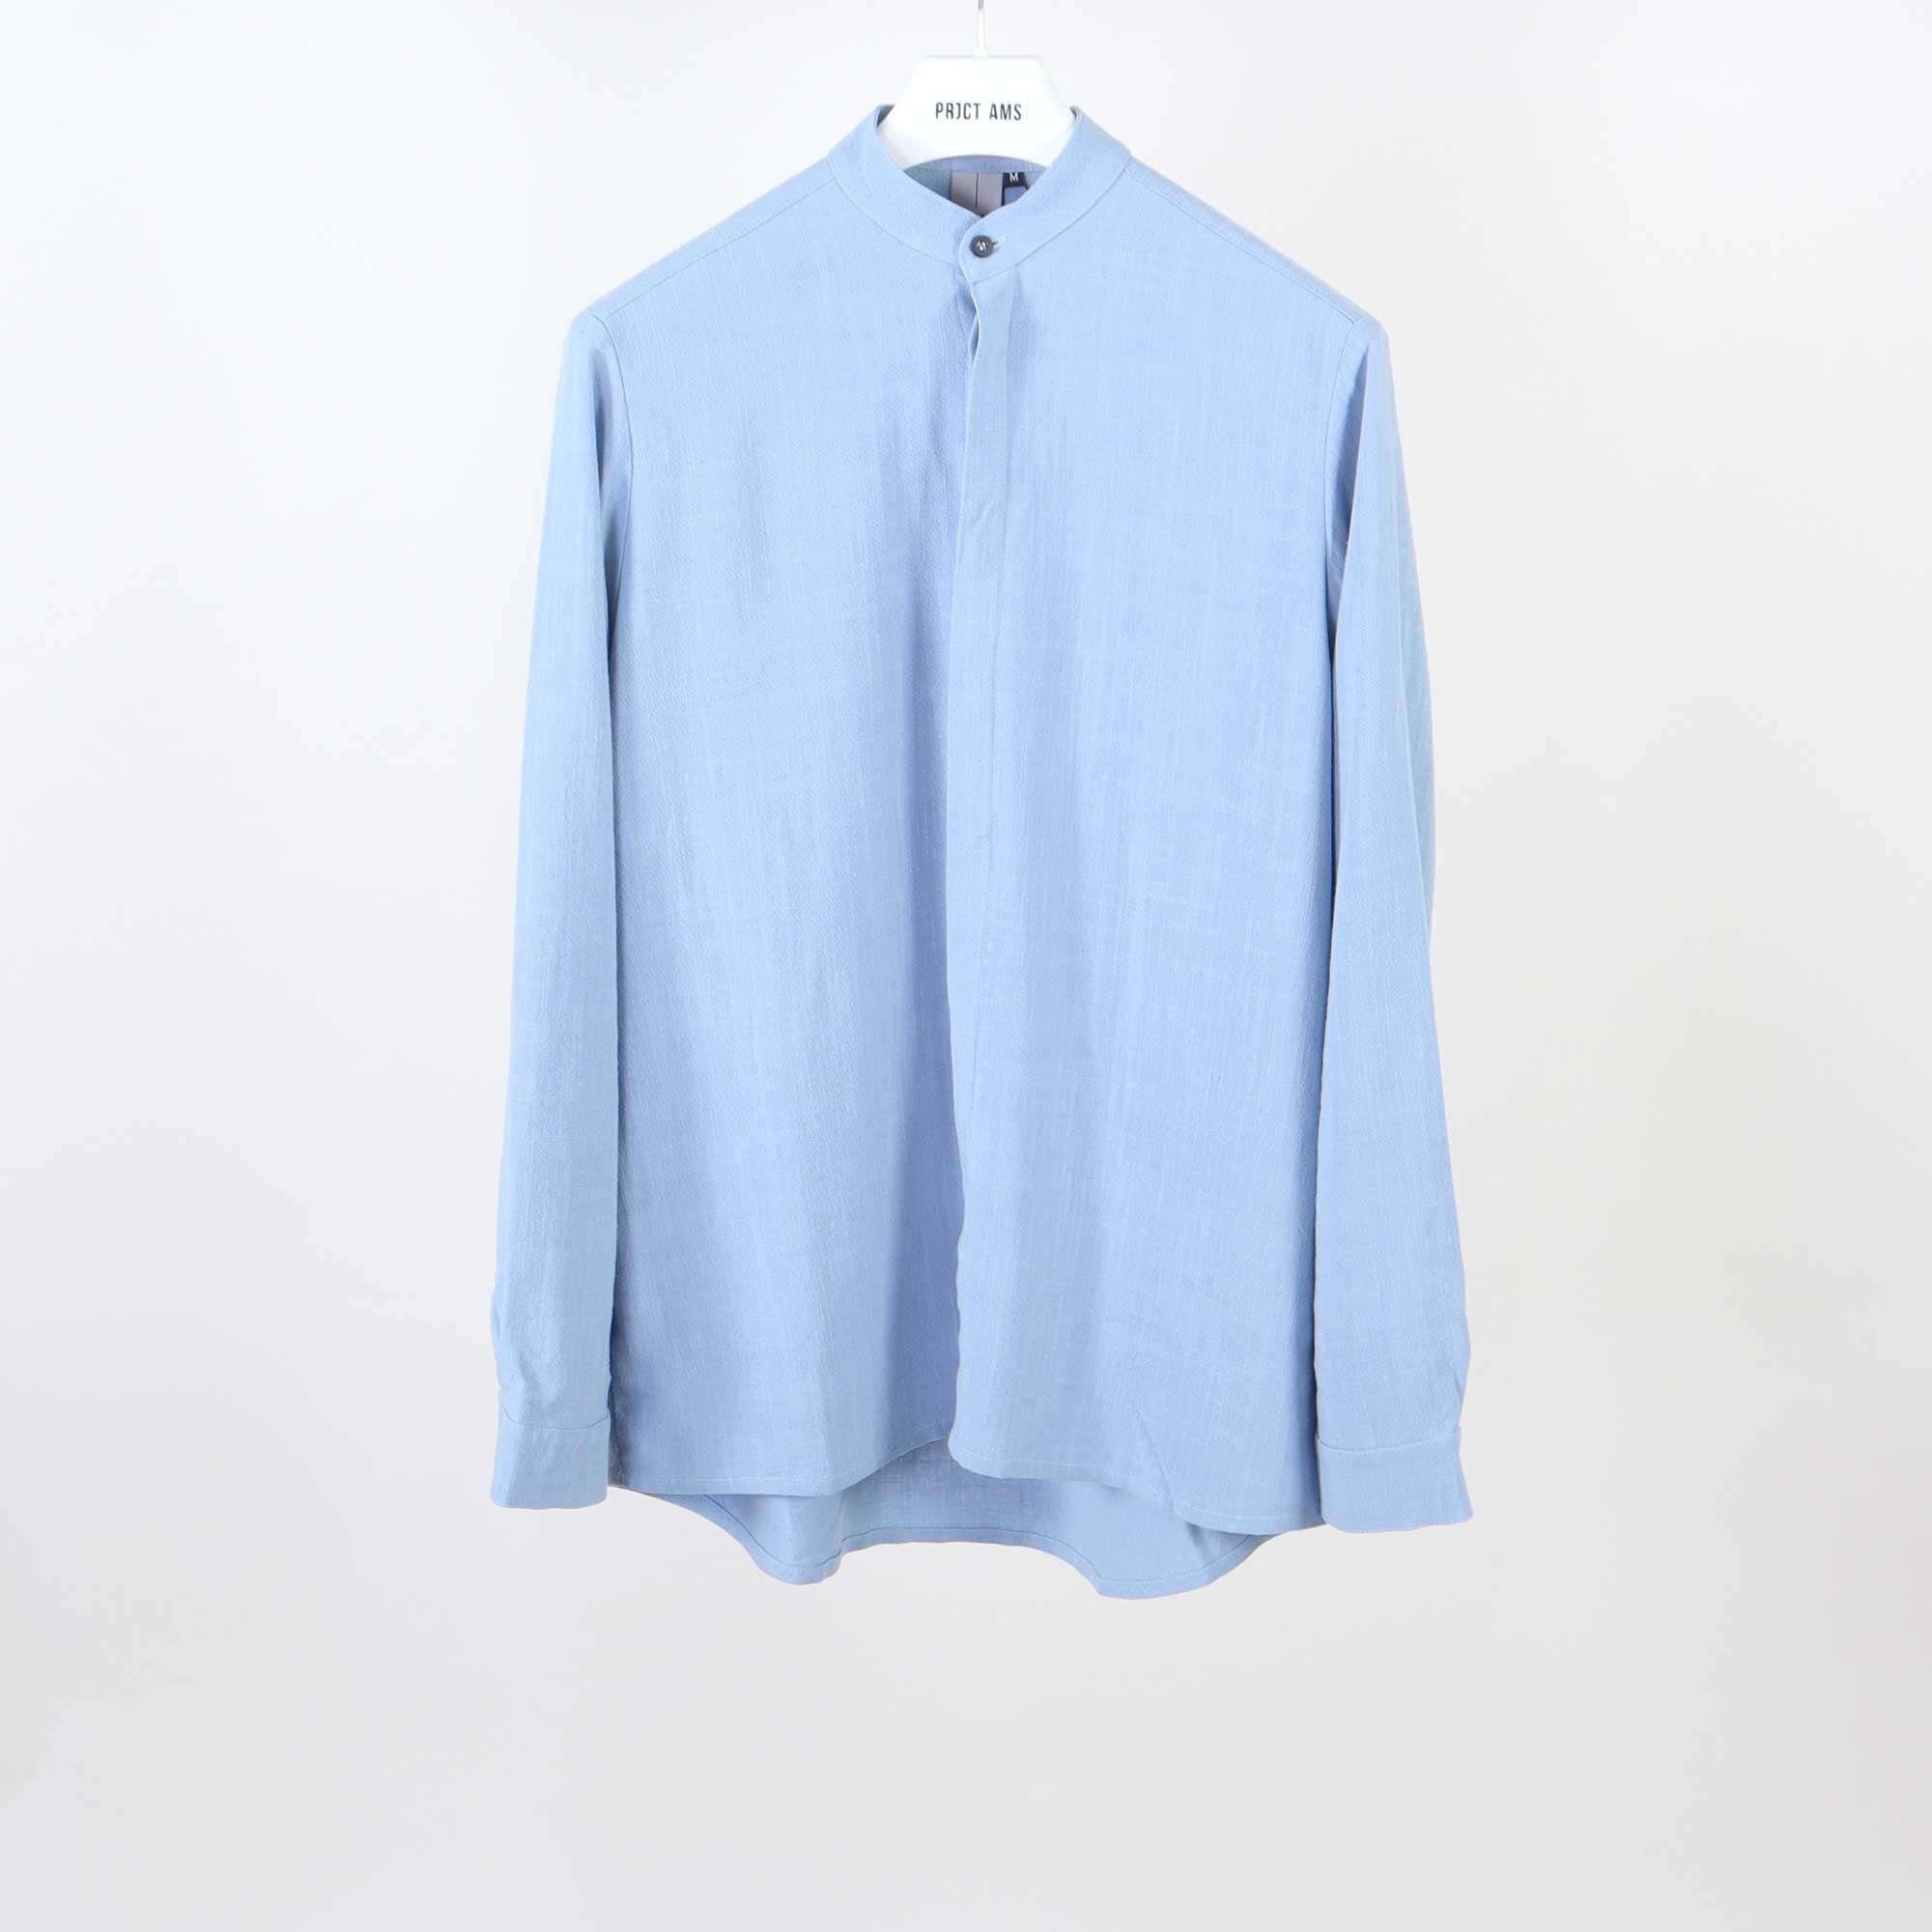 zippy-blauw-7